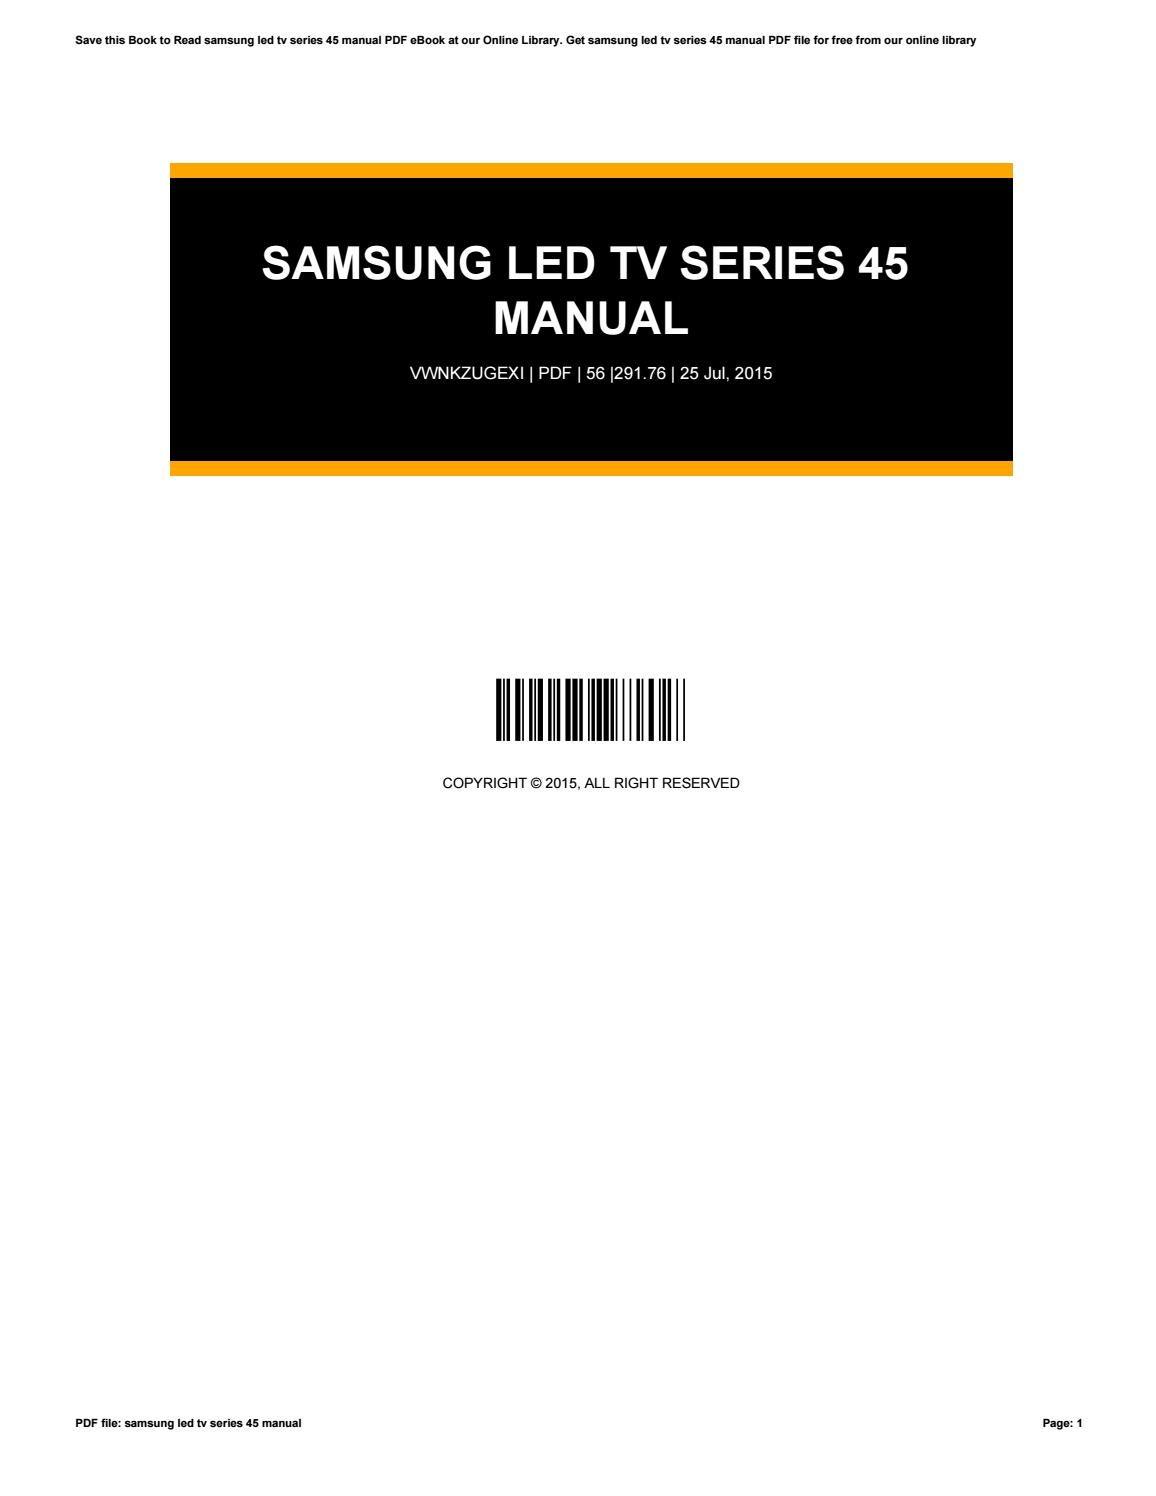 samsung series 8000 e manual